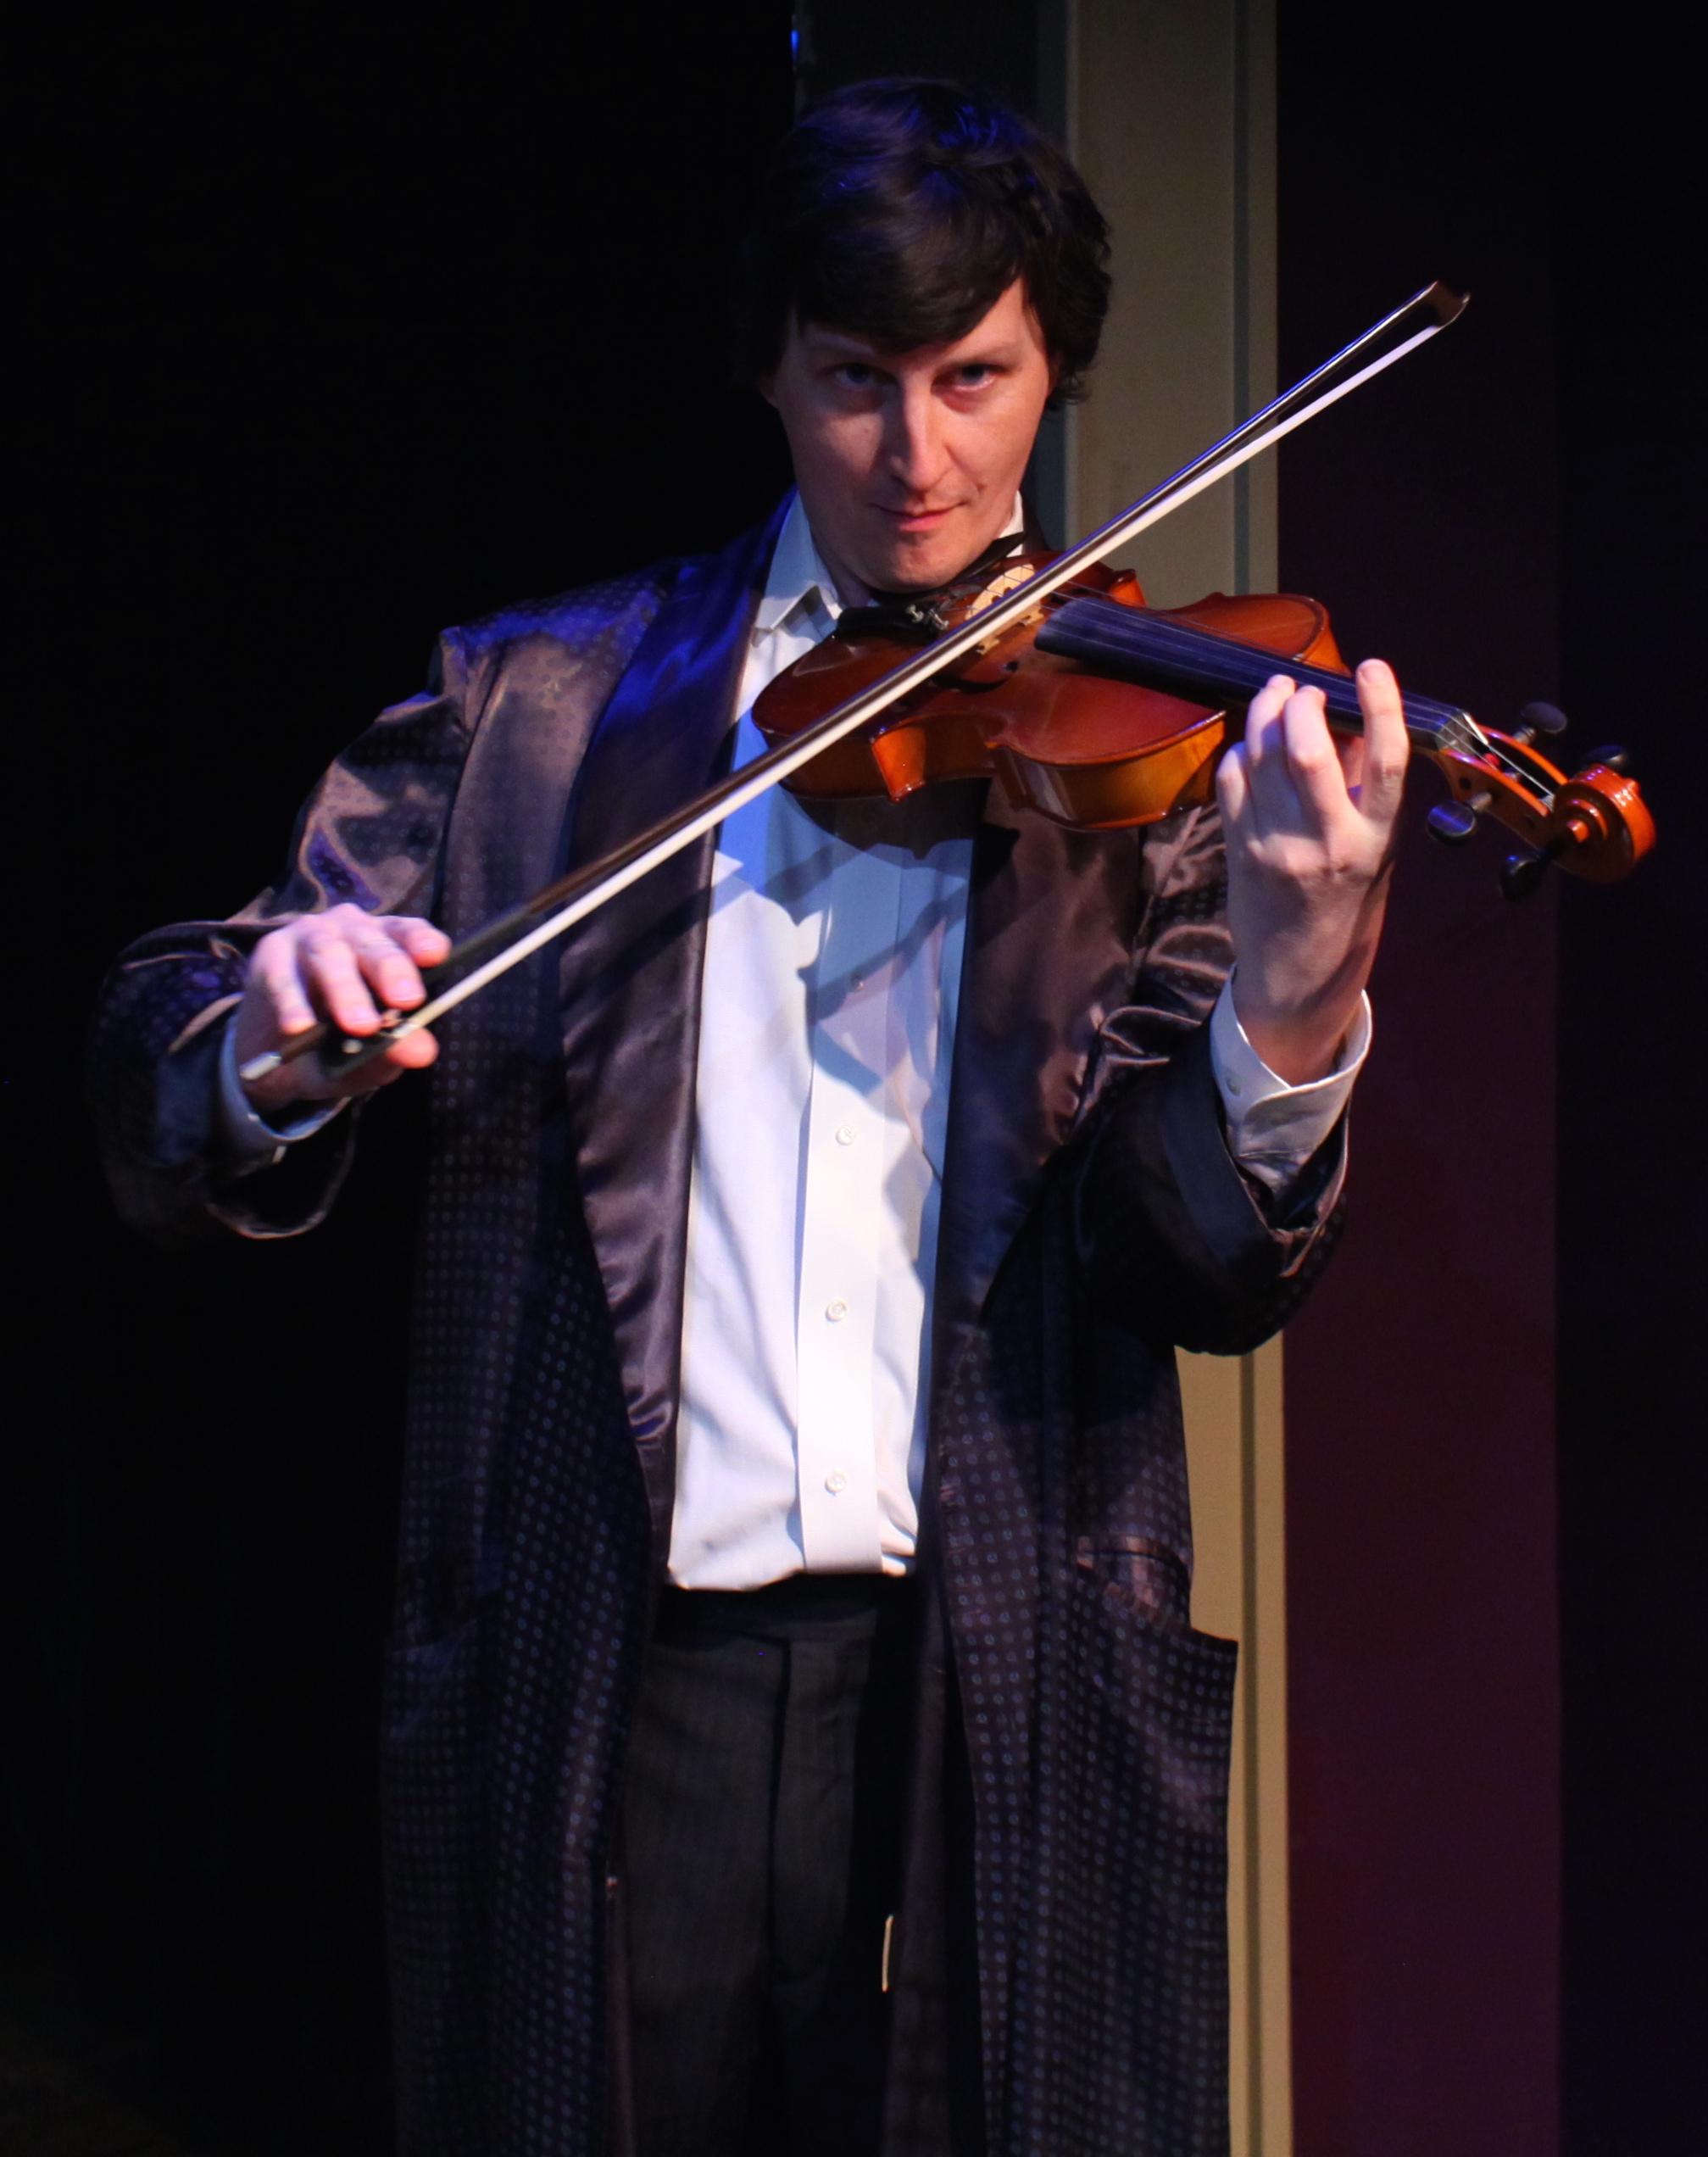 Sherlock Holmes (Matt Sims) with violin